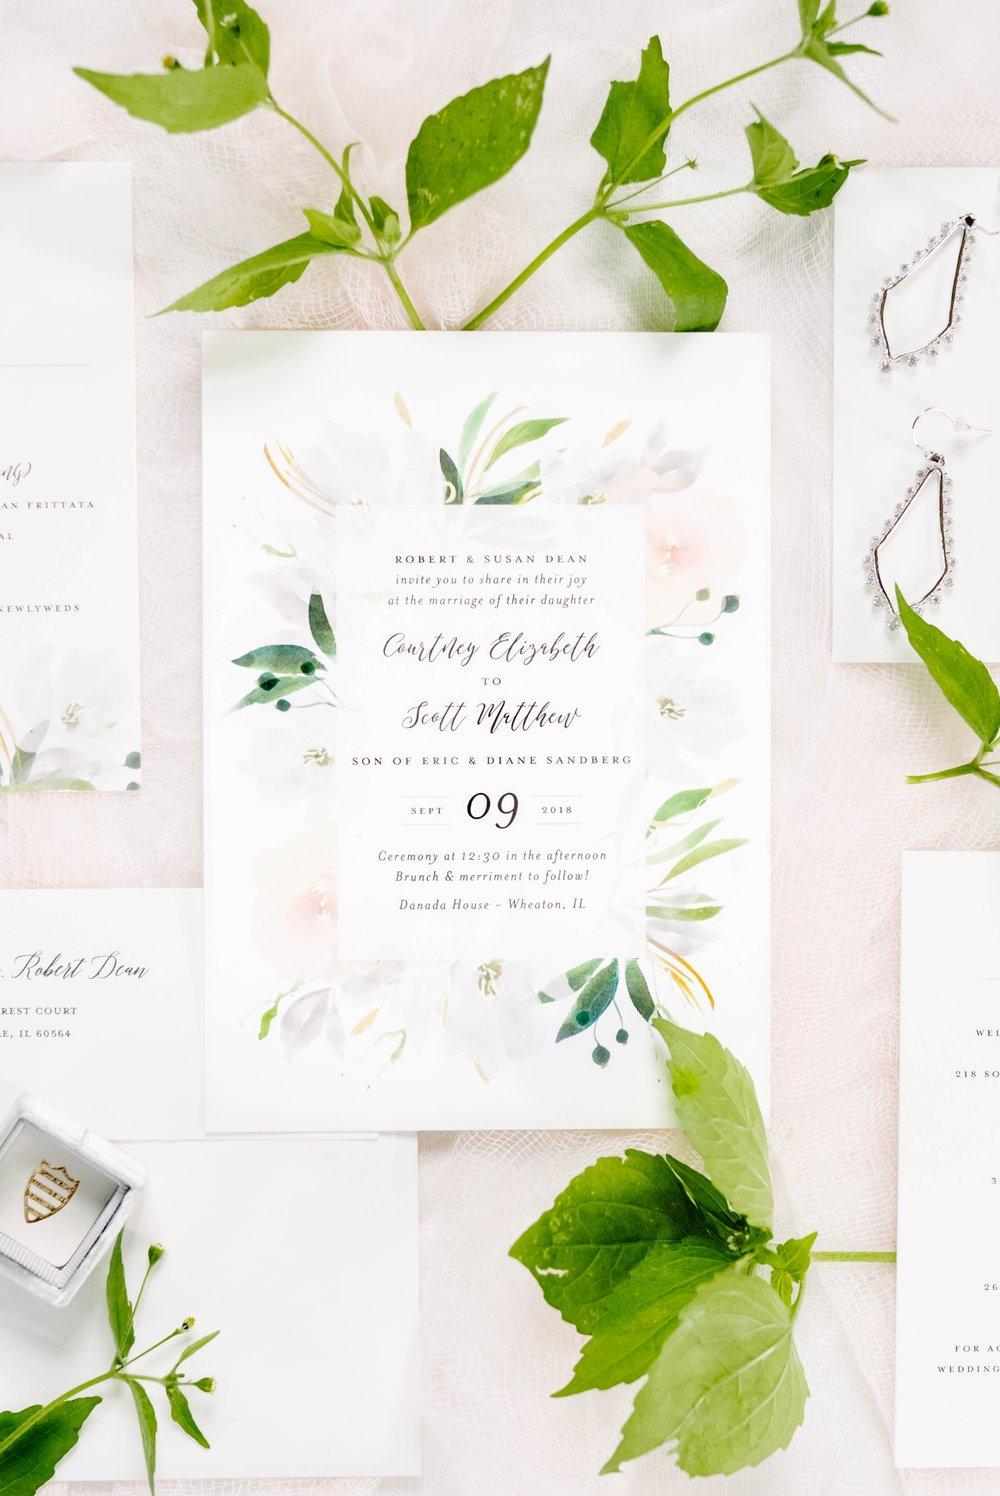 danada-house-fine-art-wedding-photography-sandberg2